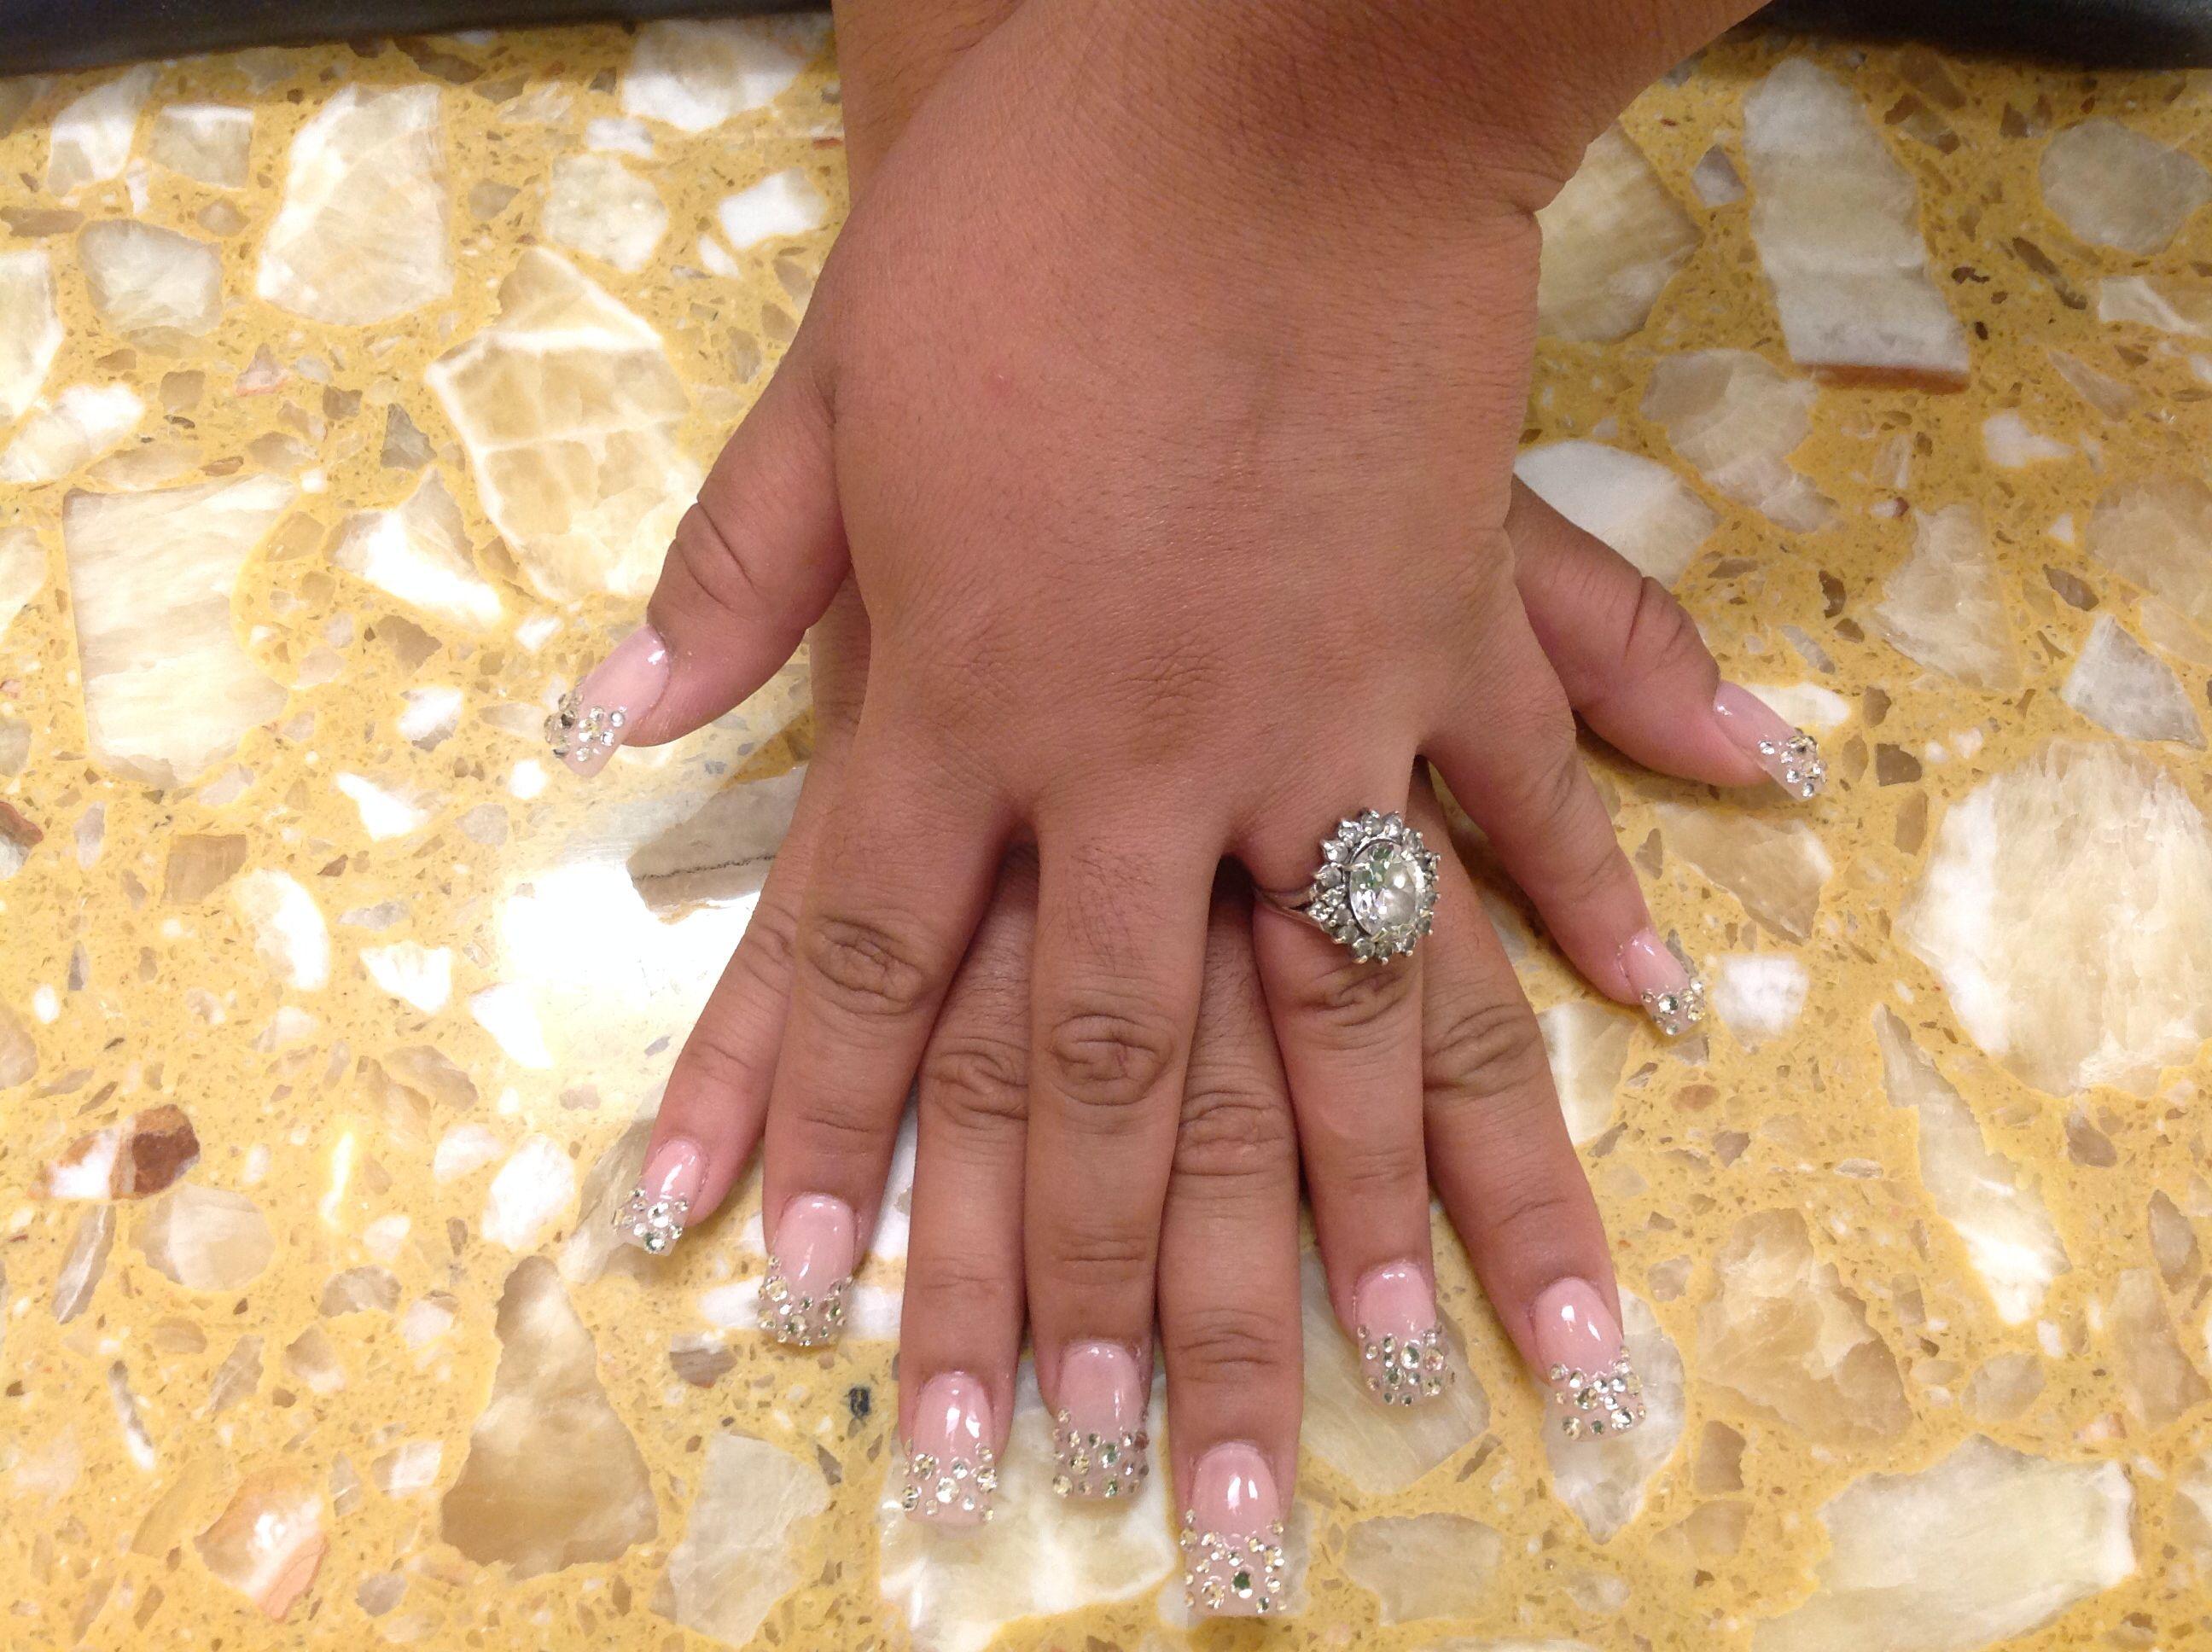 Diamond nails | Nails art by Kaly\'s Nails & Spa | Pinterest ...